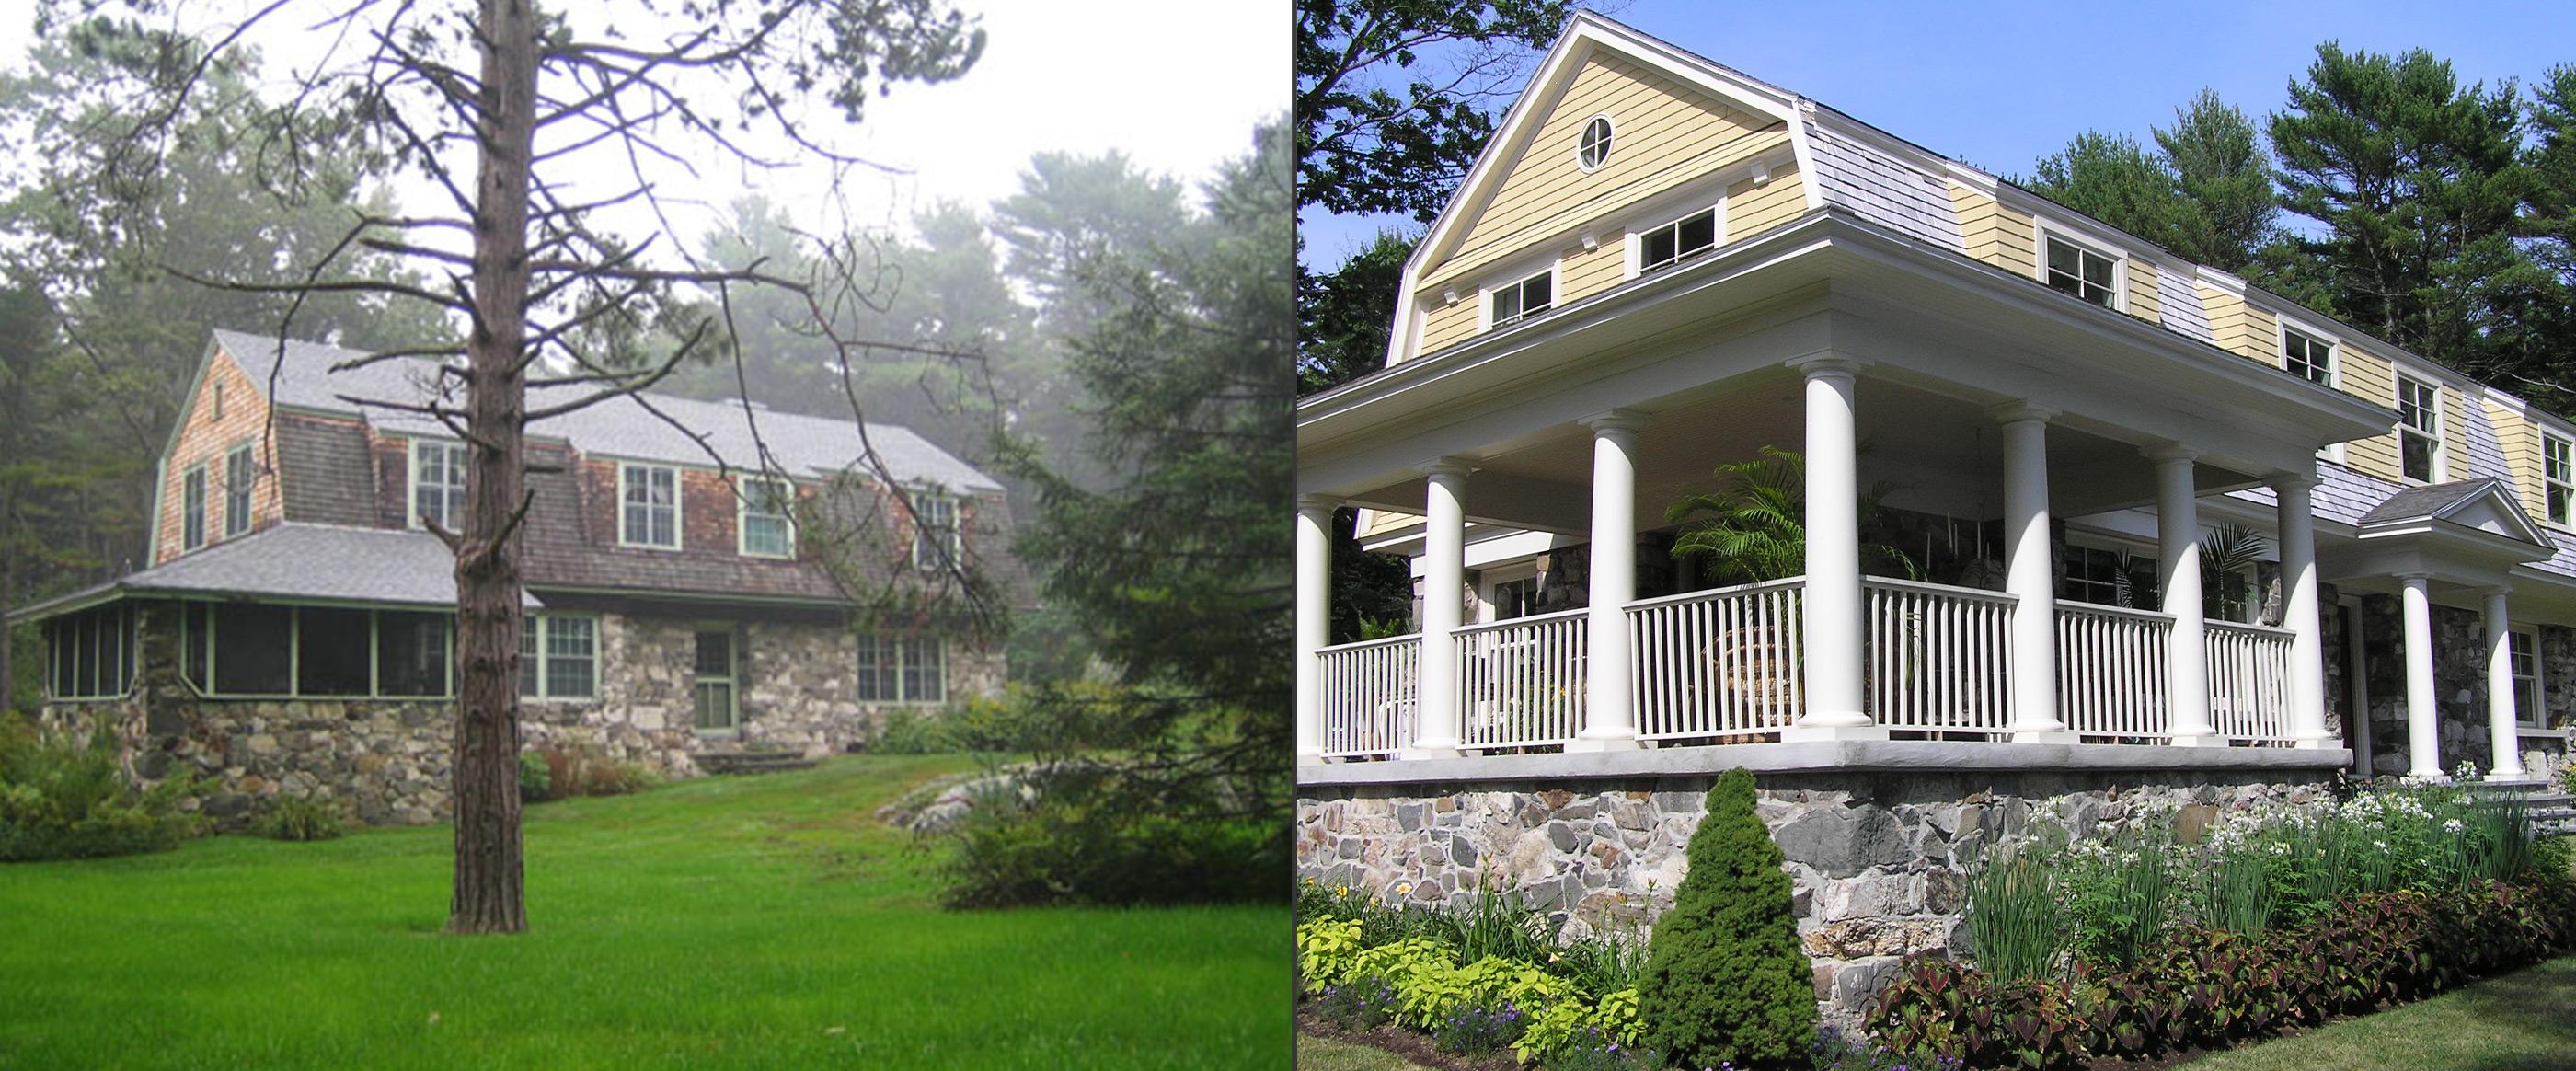 pocahontas-exterior-before-after